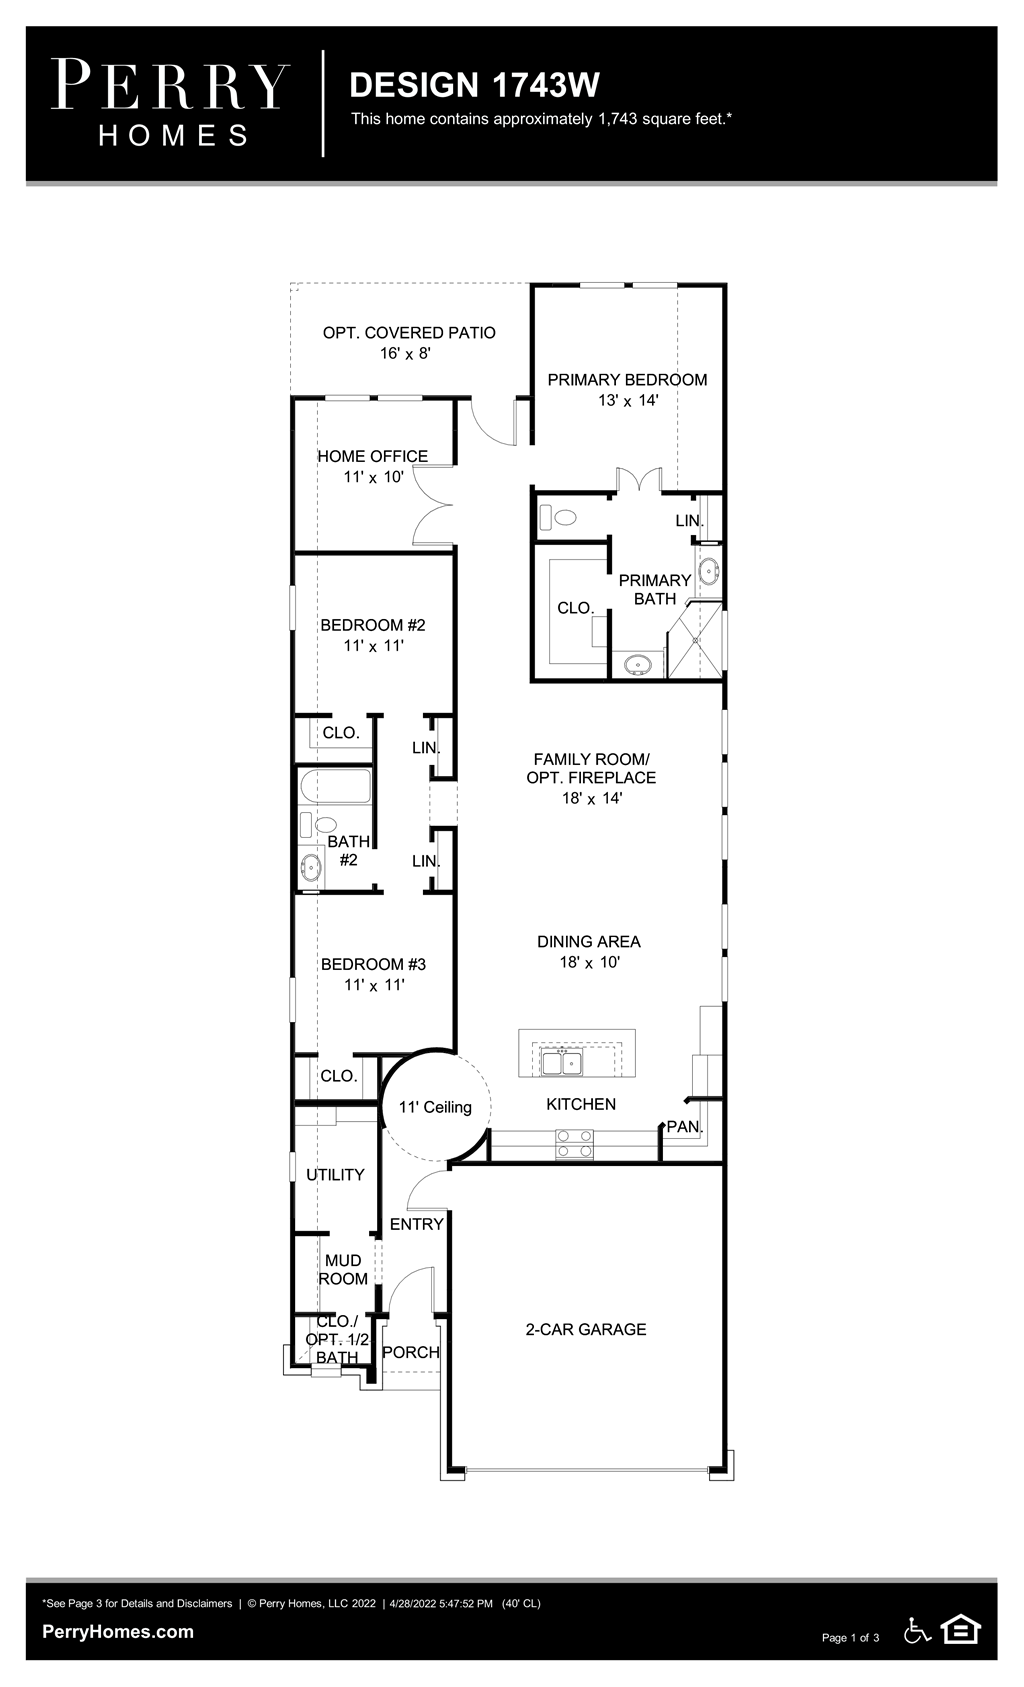 Floor Plan for 1743W